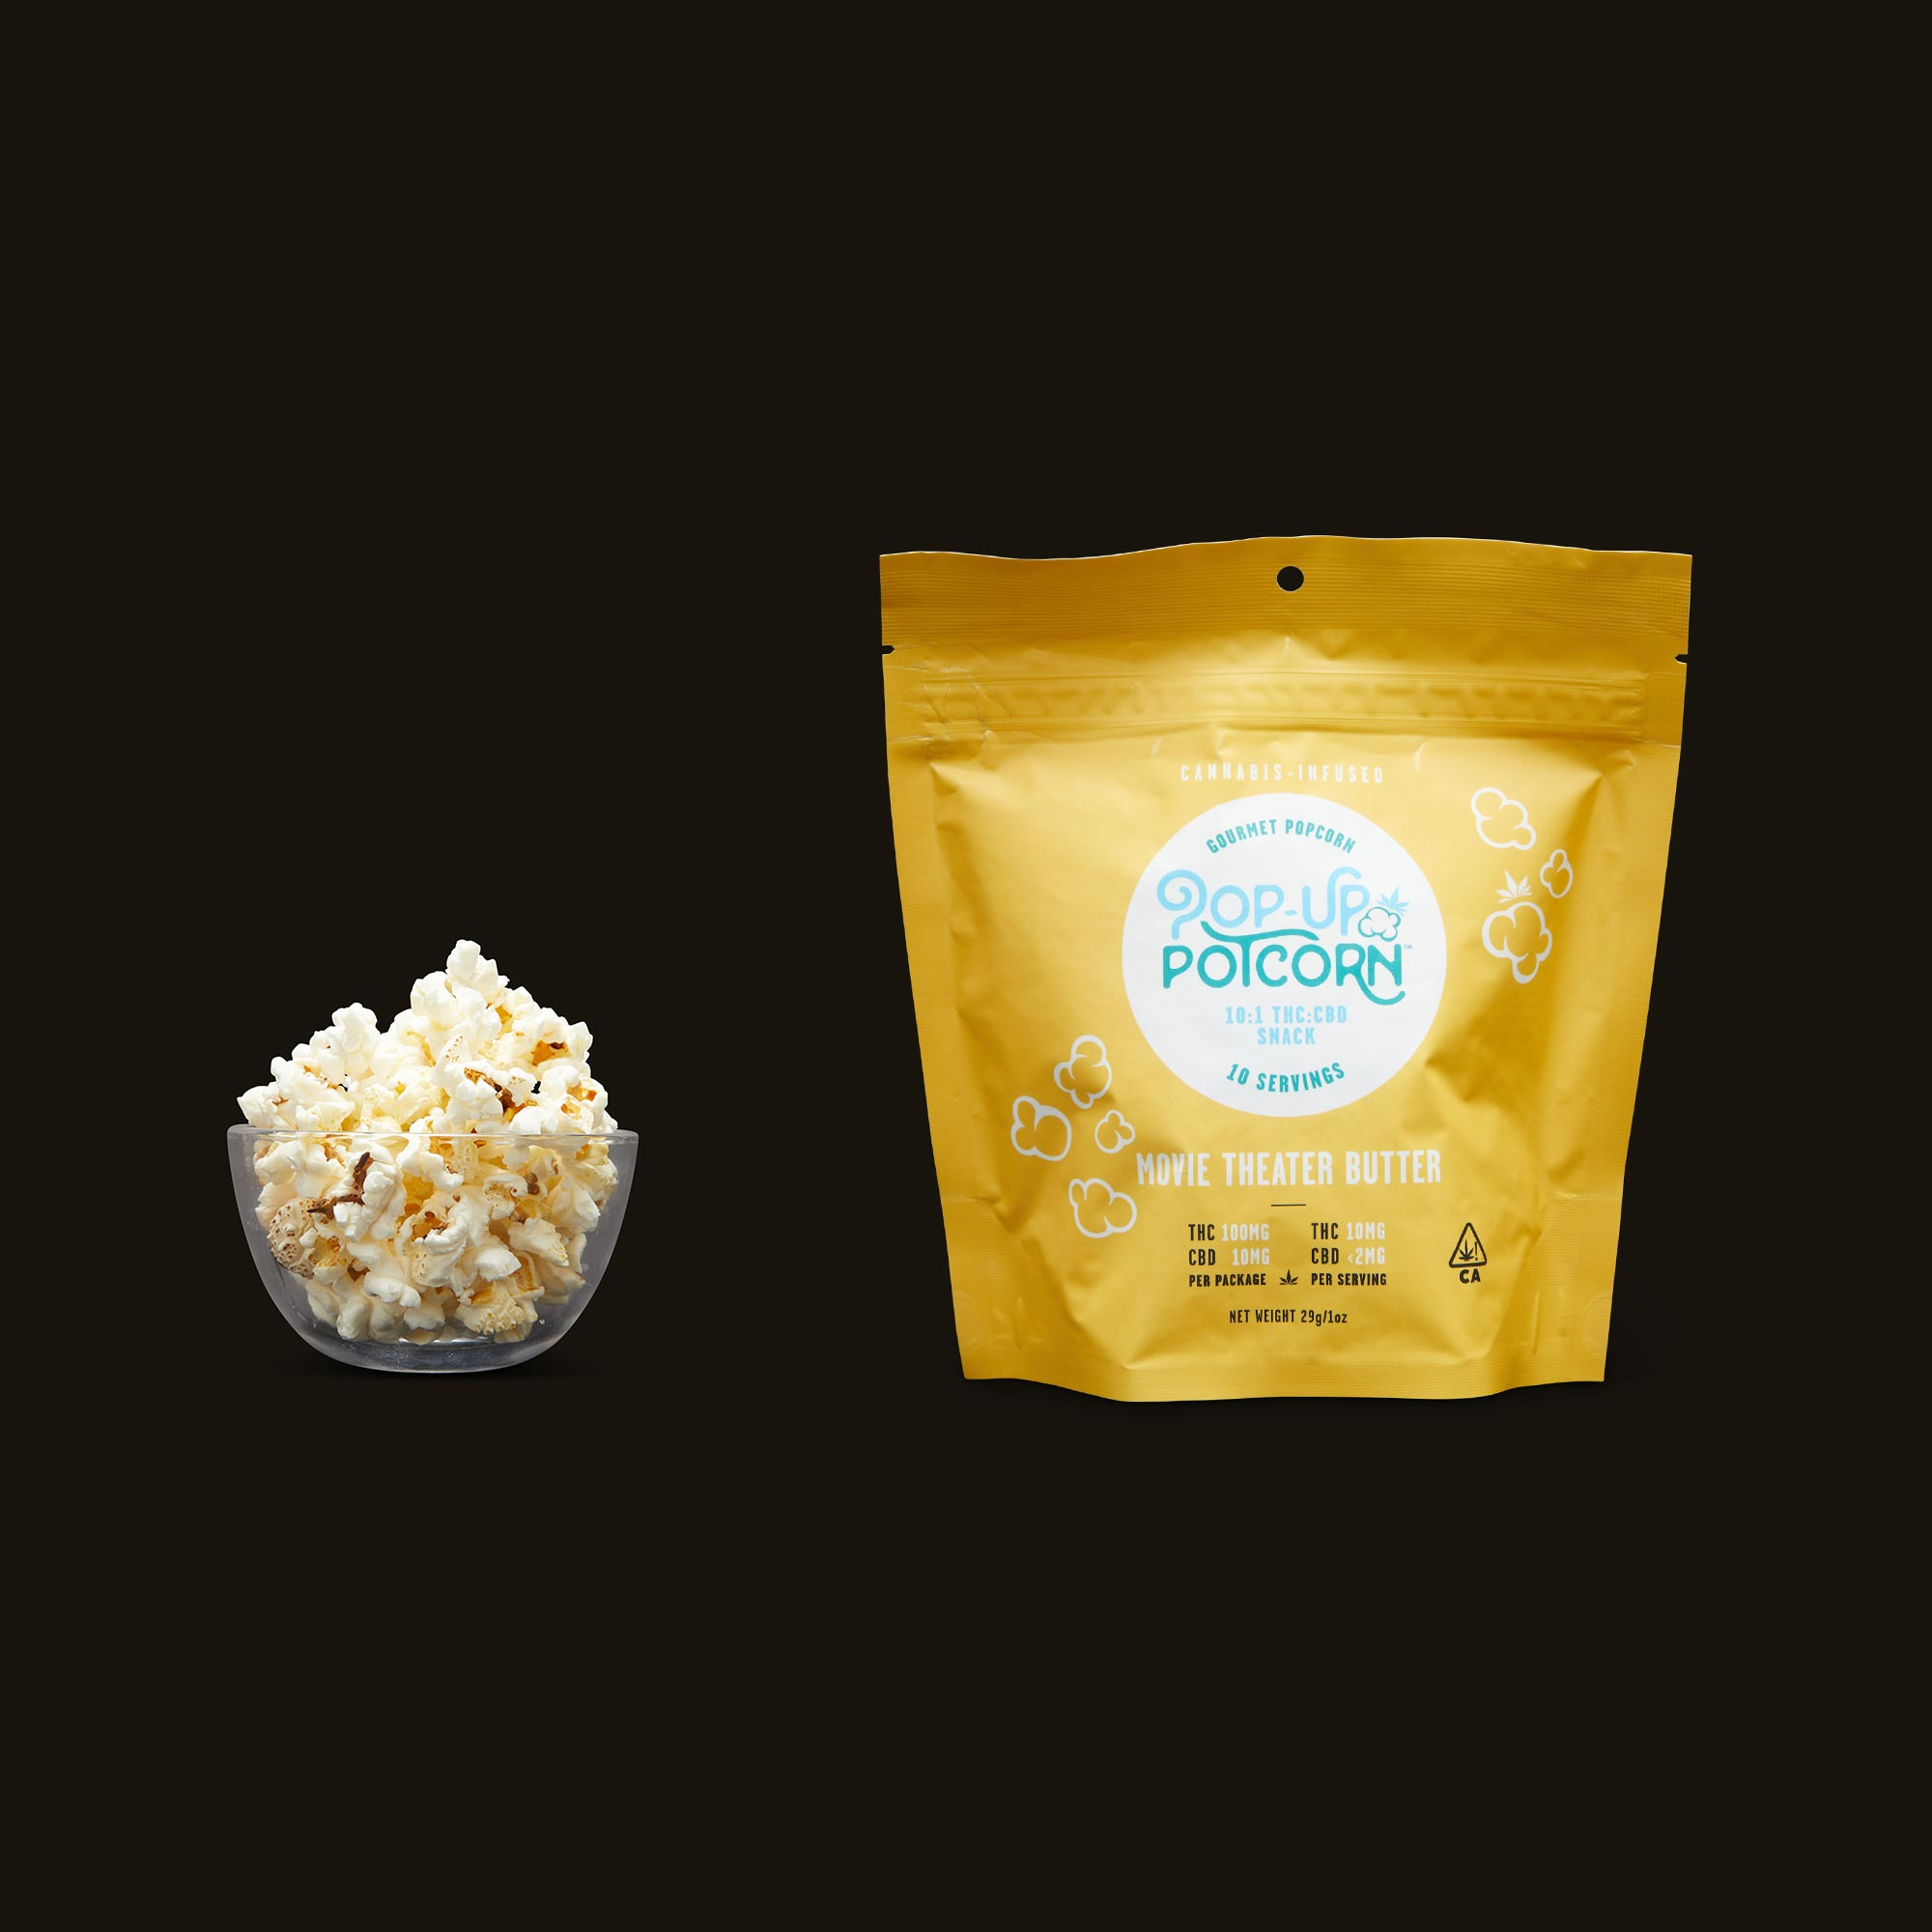 Pop-Up Potcorn Movie Theater Butter Popcorn 10:1 - 10 Servings